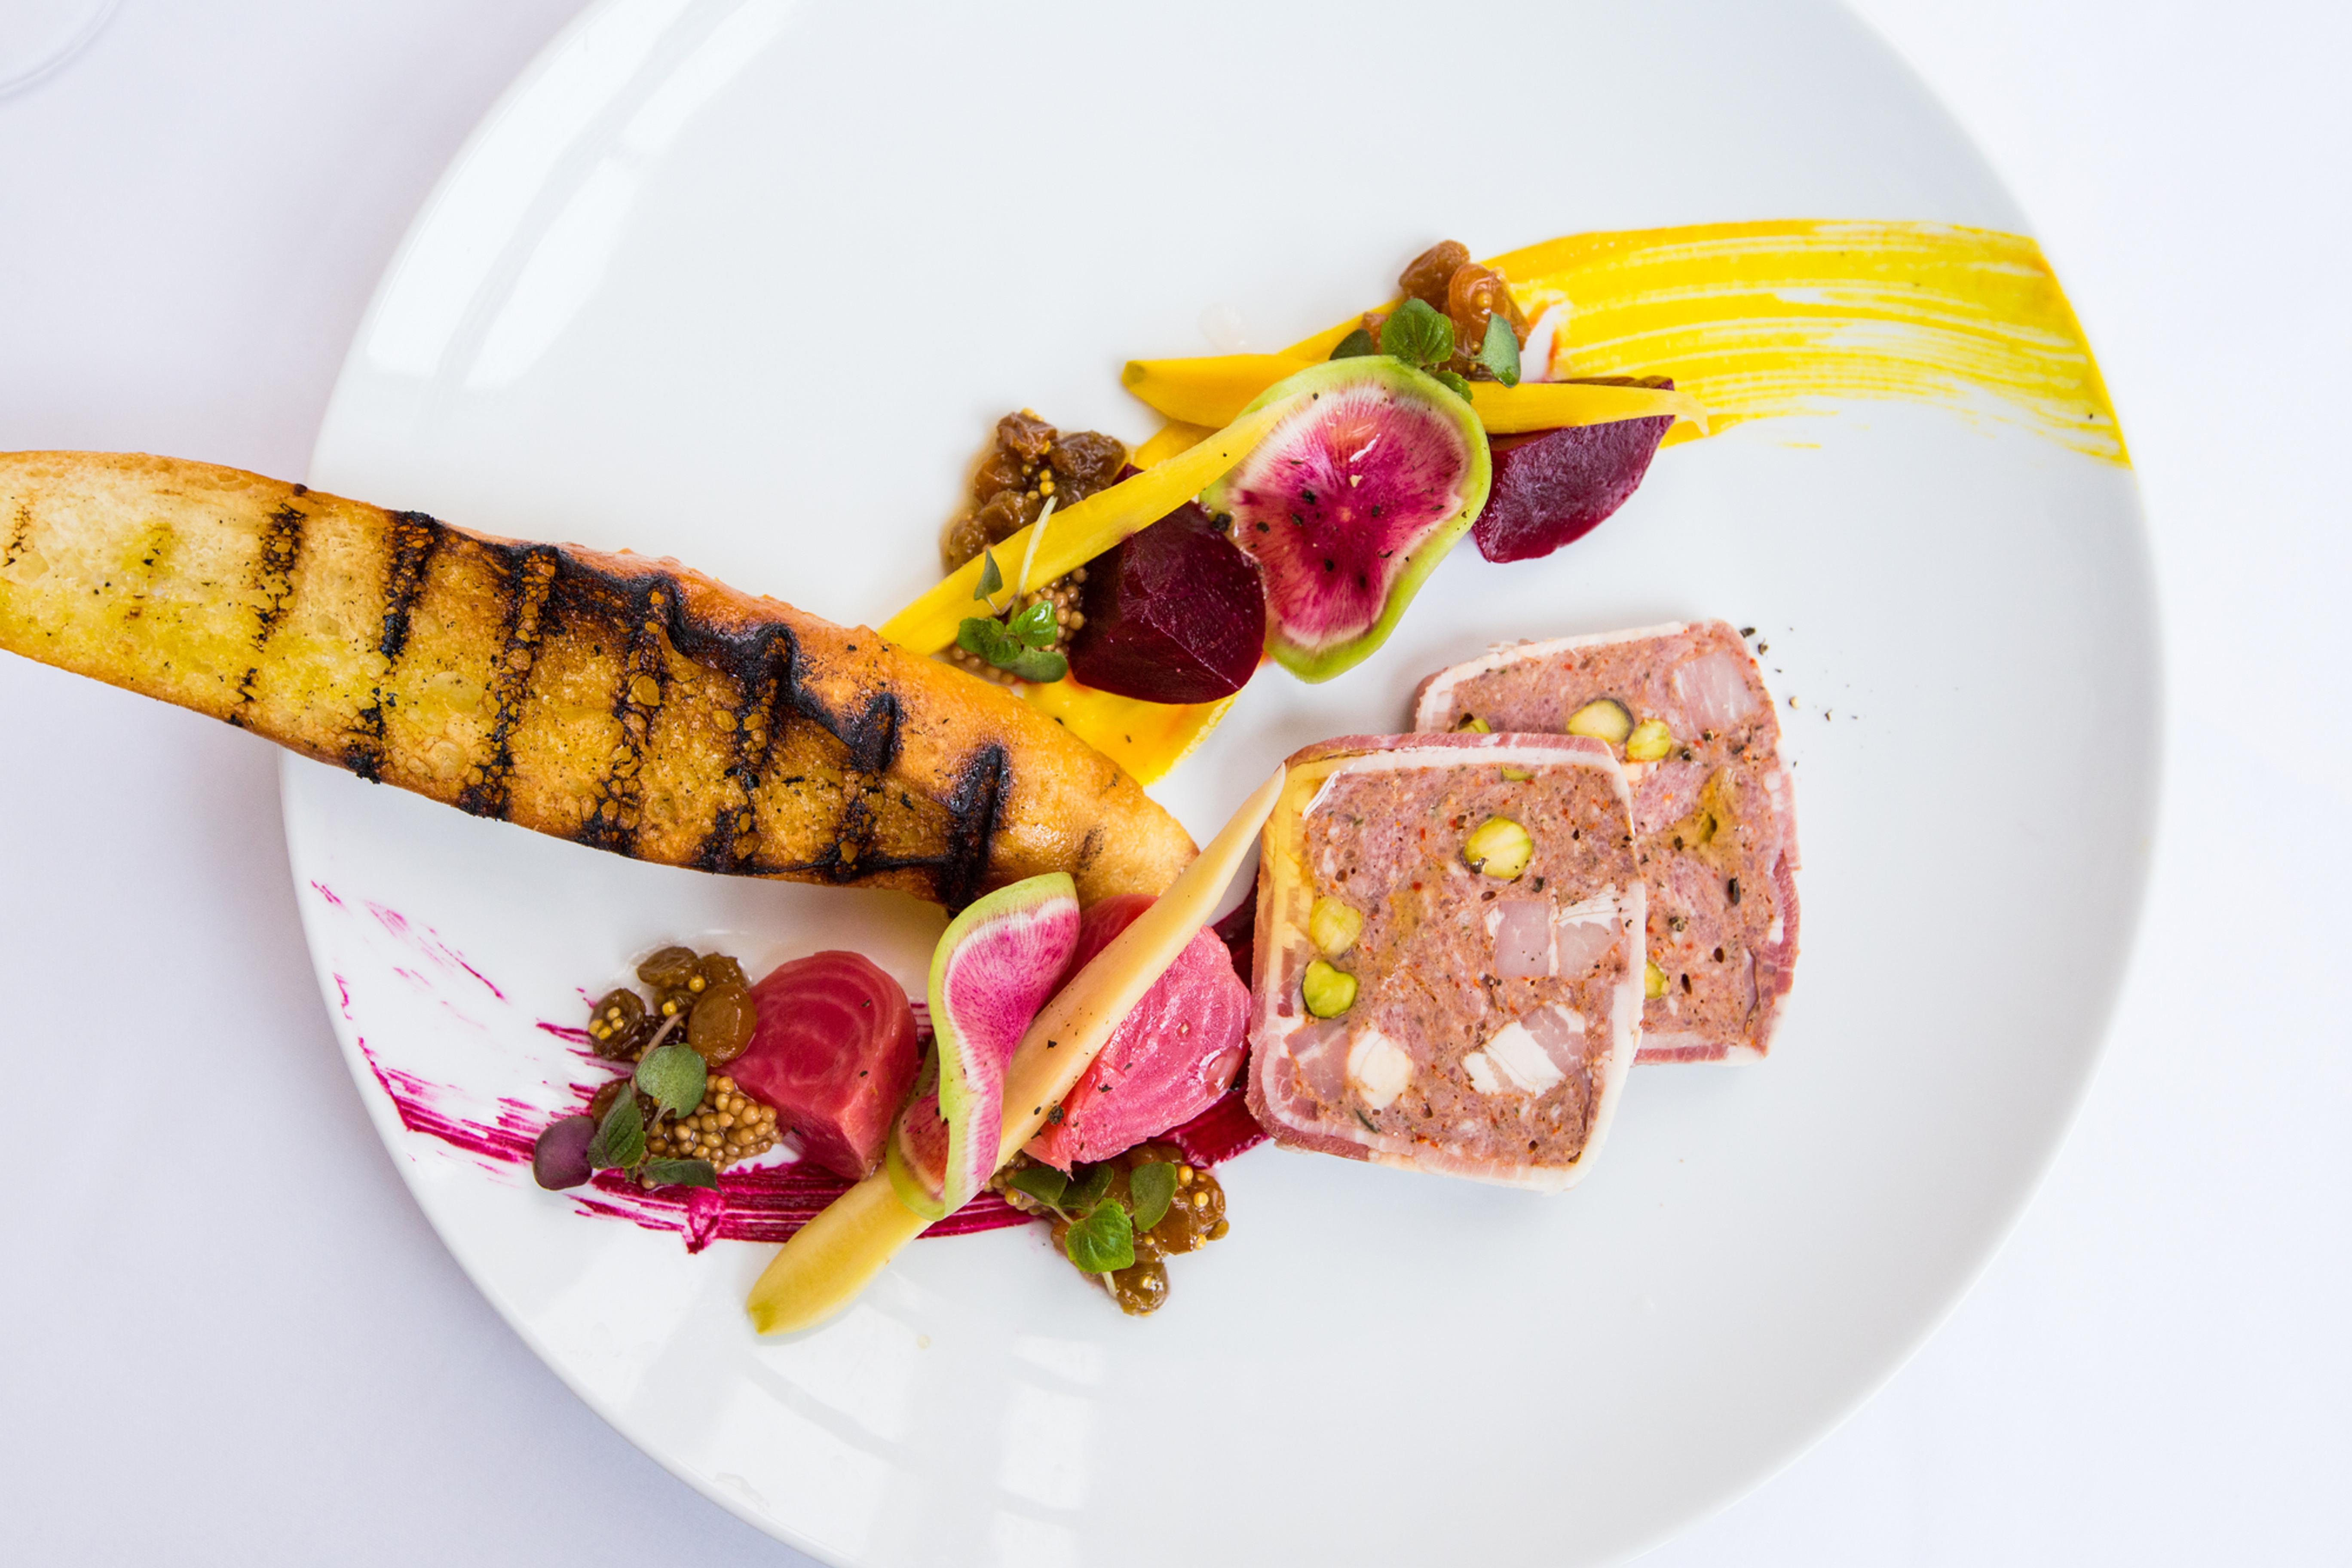 Restaurant/Hospitality Shoot